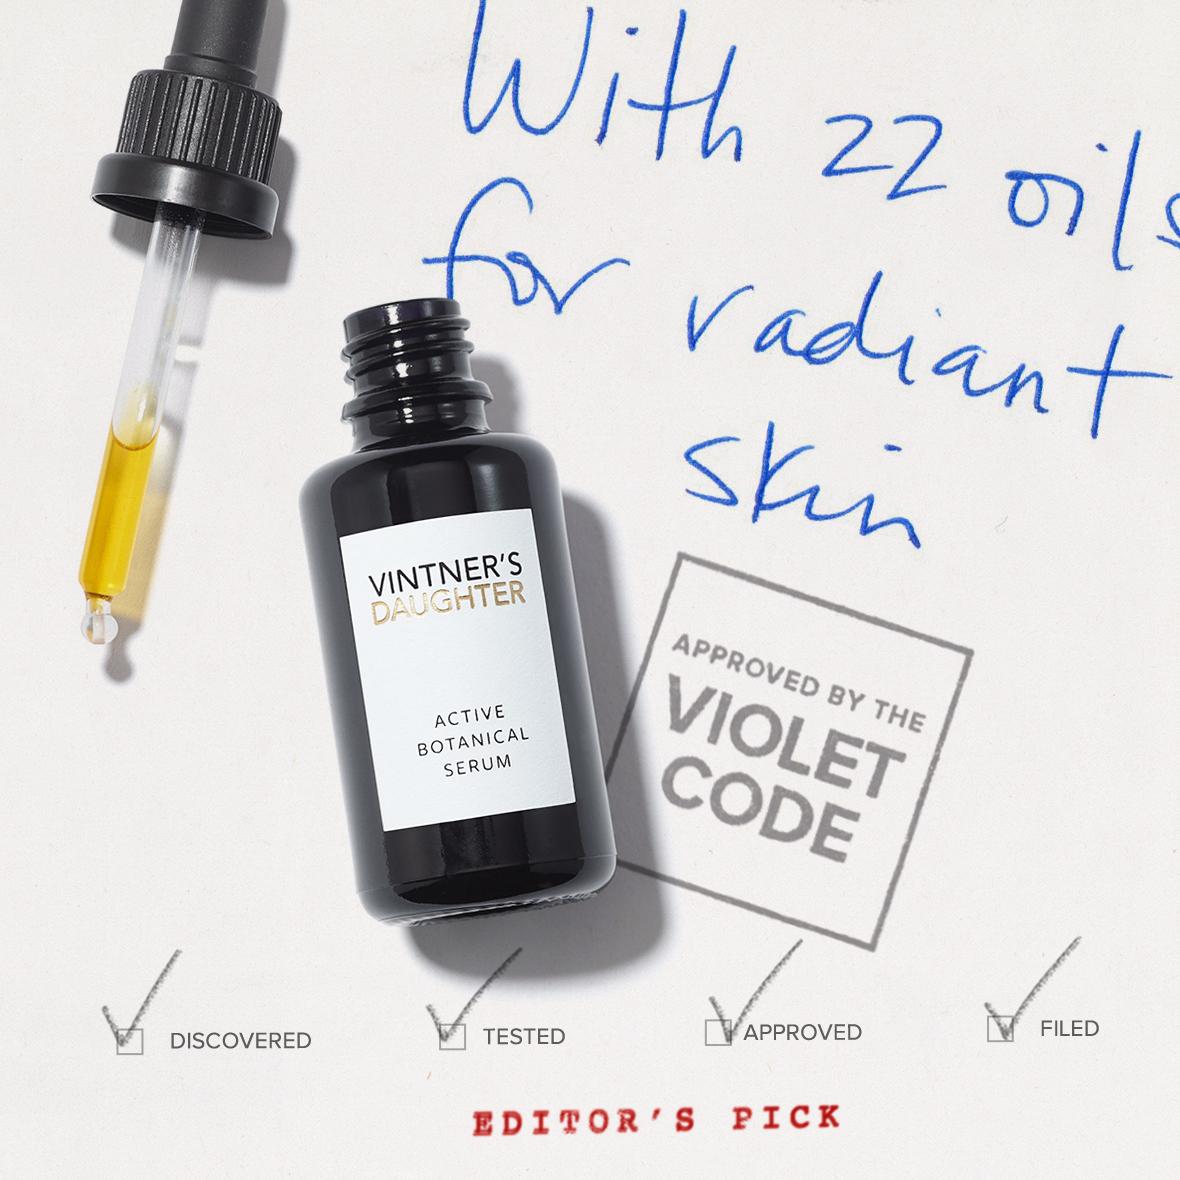 ABTVC-Social-Editors-Pick-vintners-daughter-active-botanical-serum.jpg